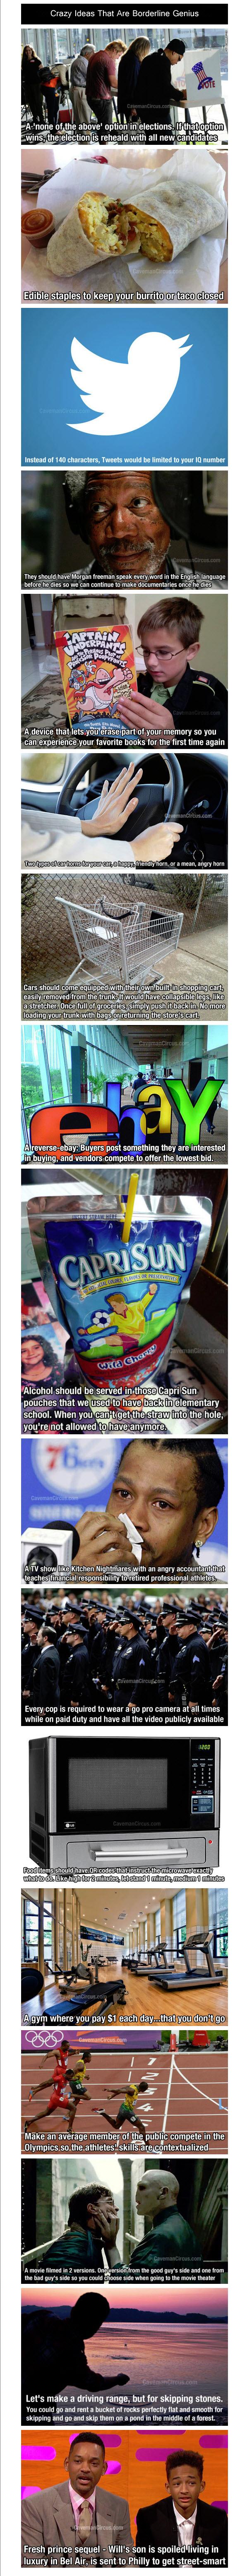 crazy ideas.jpg